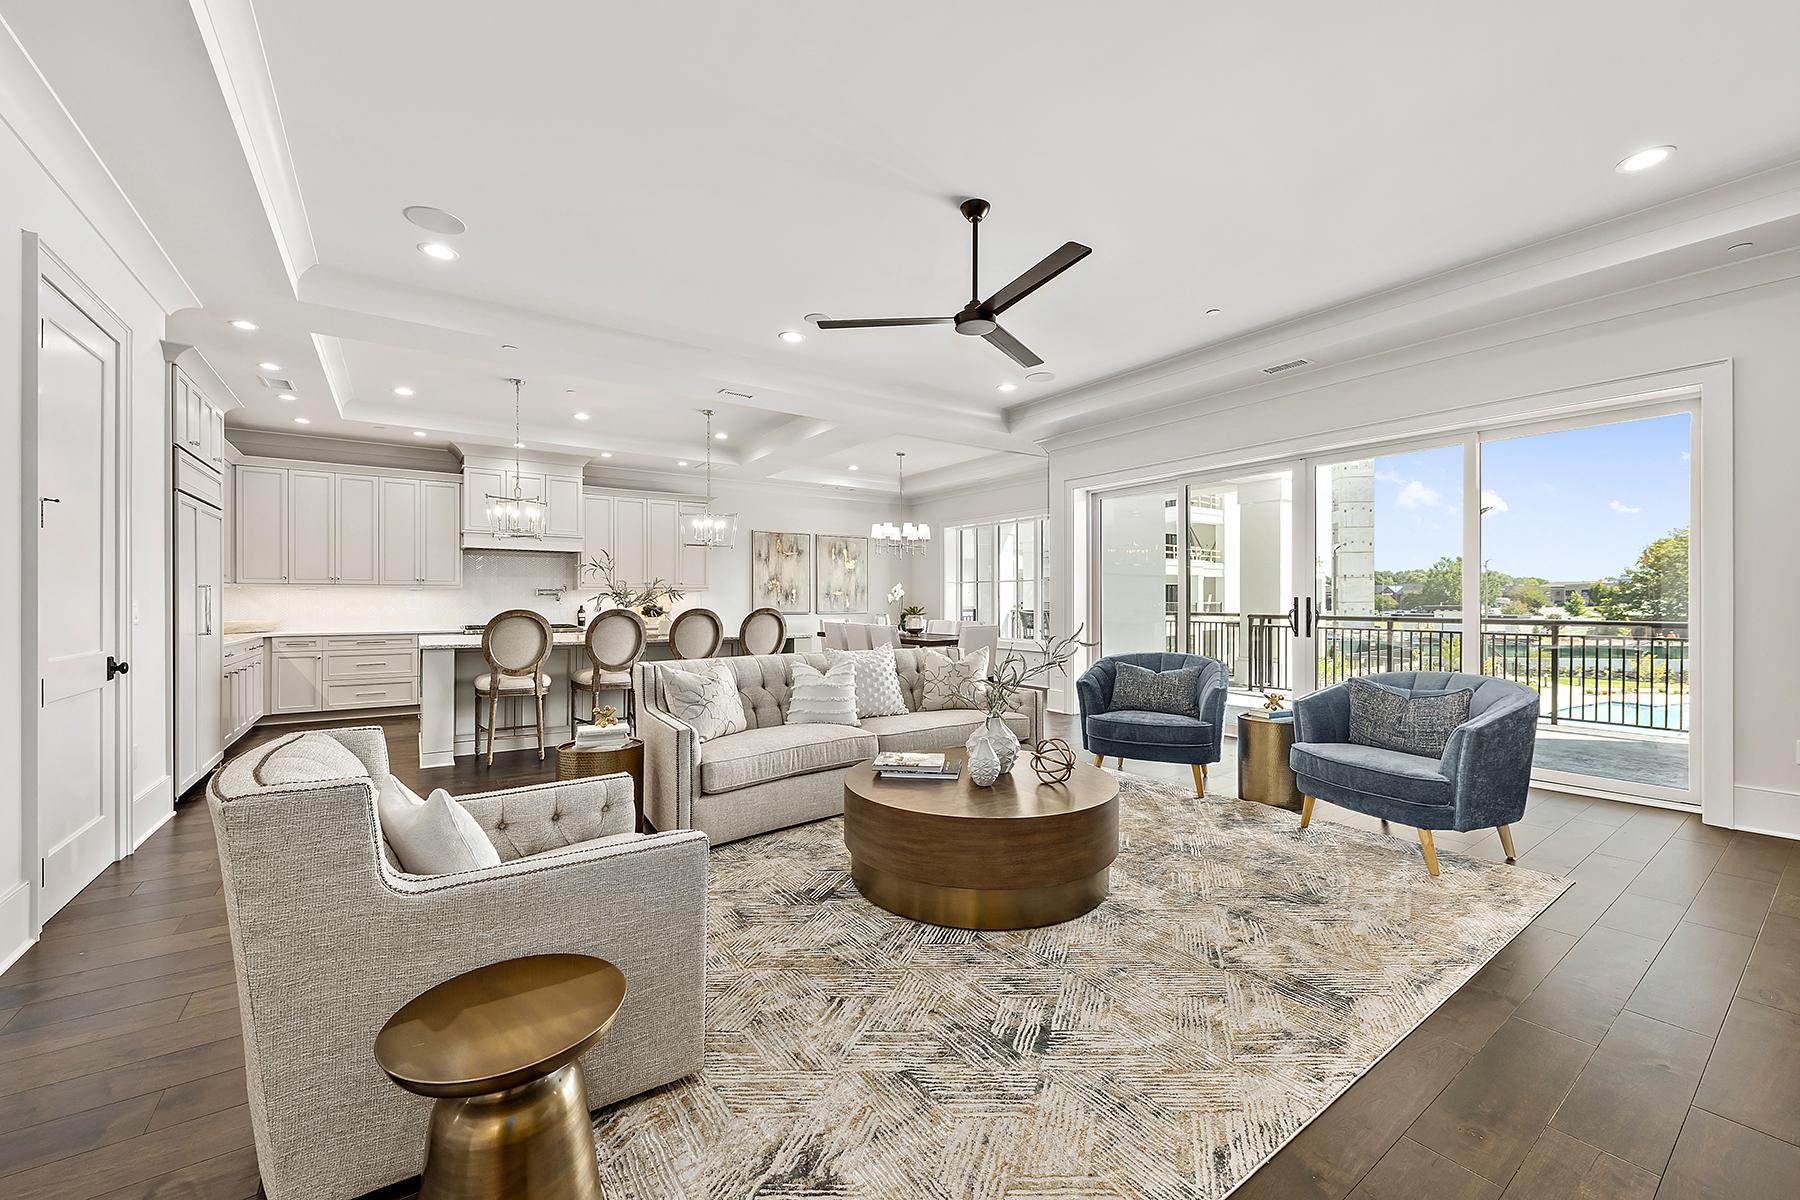 Condominiums 为 销售 在 19329 Watermark Dr , 531, 科尼斯厄斯, 北卡罗来纳州 28031 美国